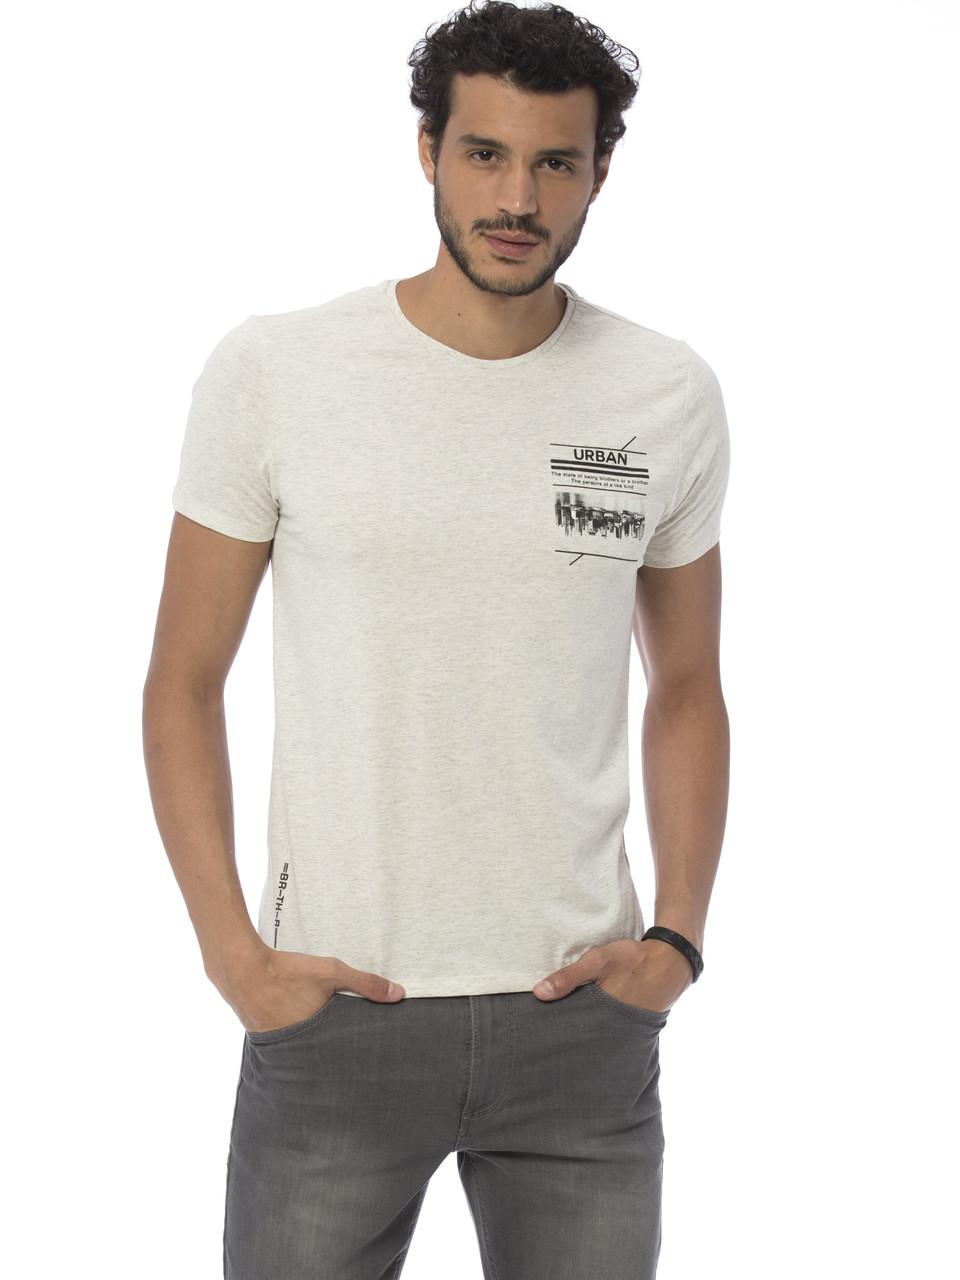 Мужская футболка Lc Waikiki / Лс Вайкики с надписью Urban